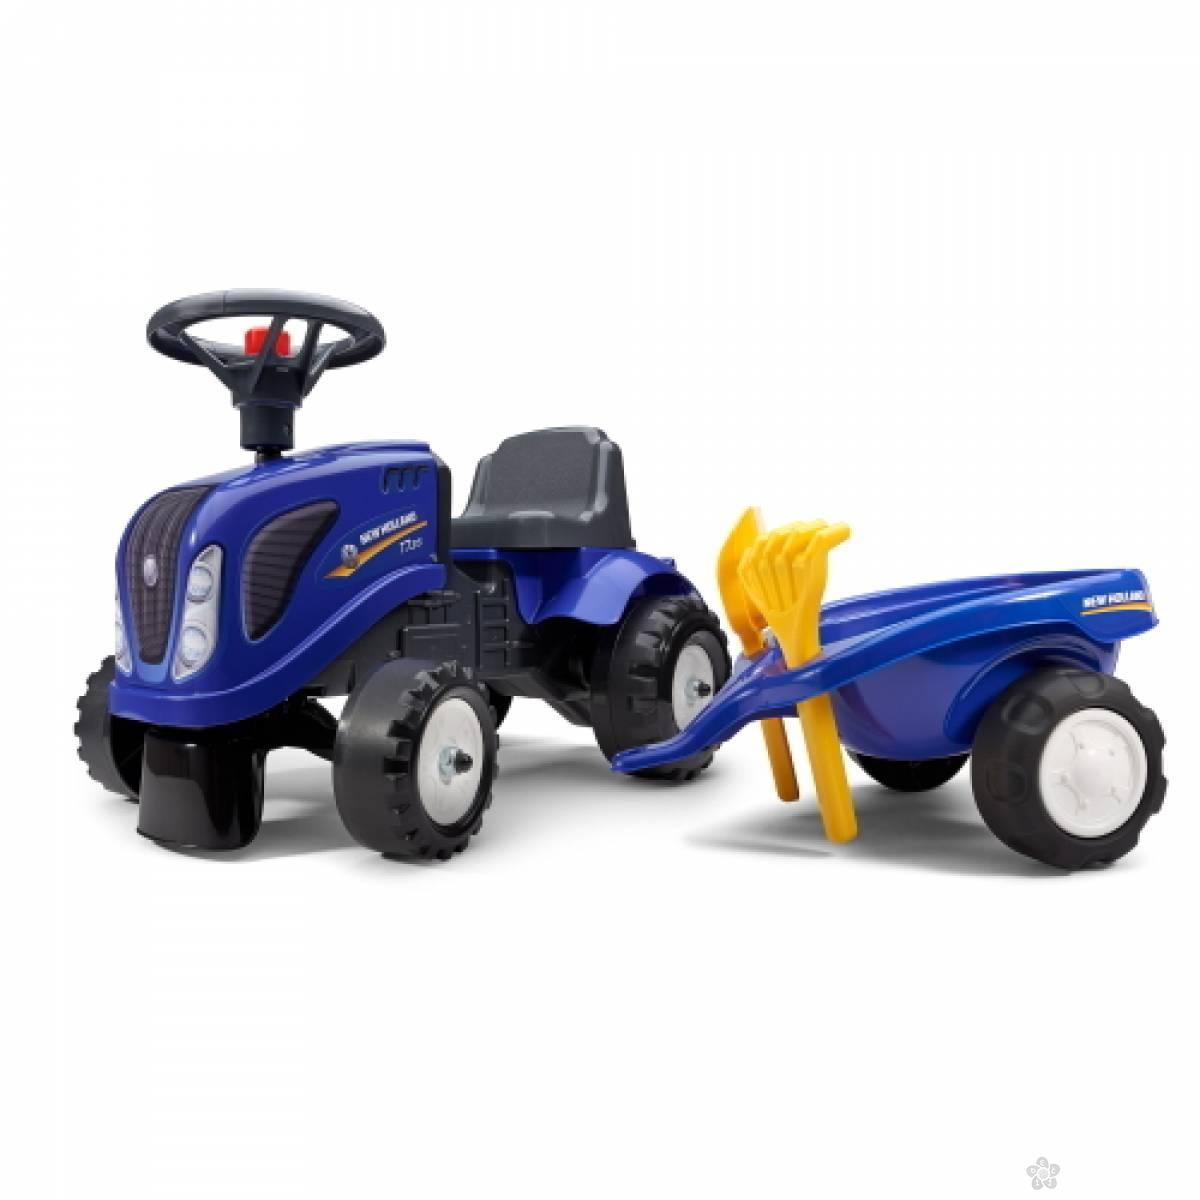 Traktor guralica New Holland 280c